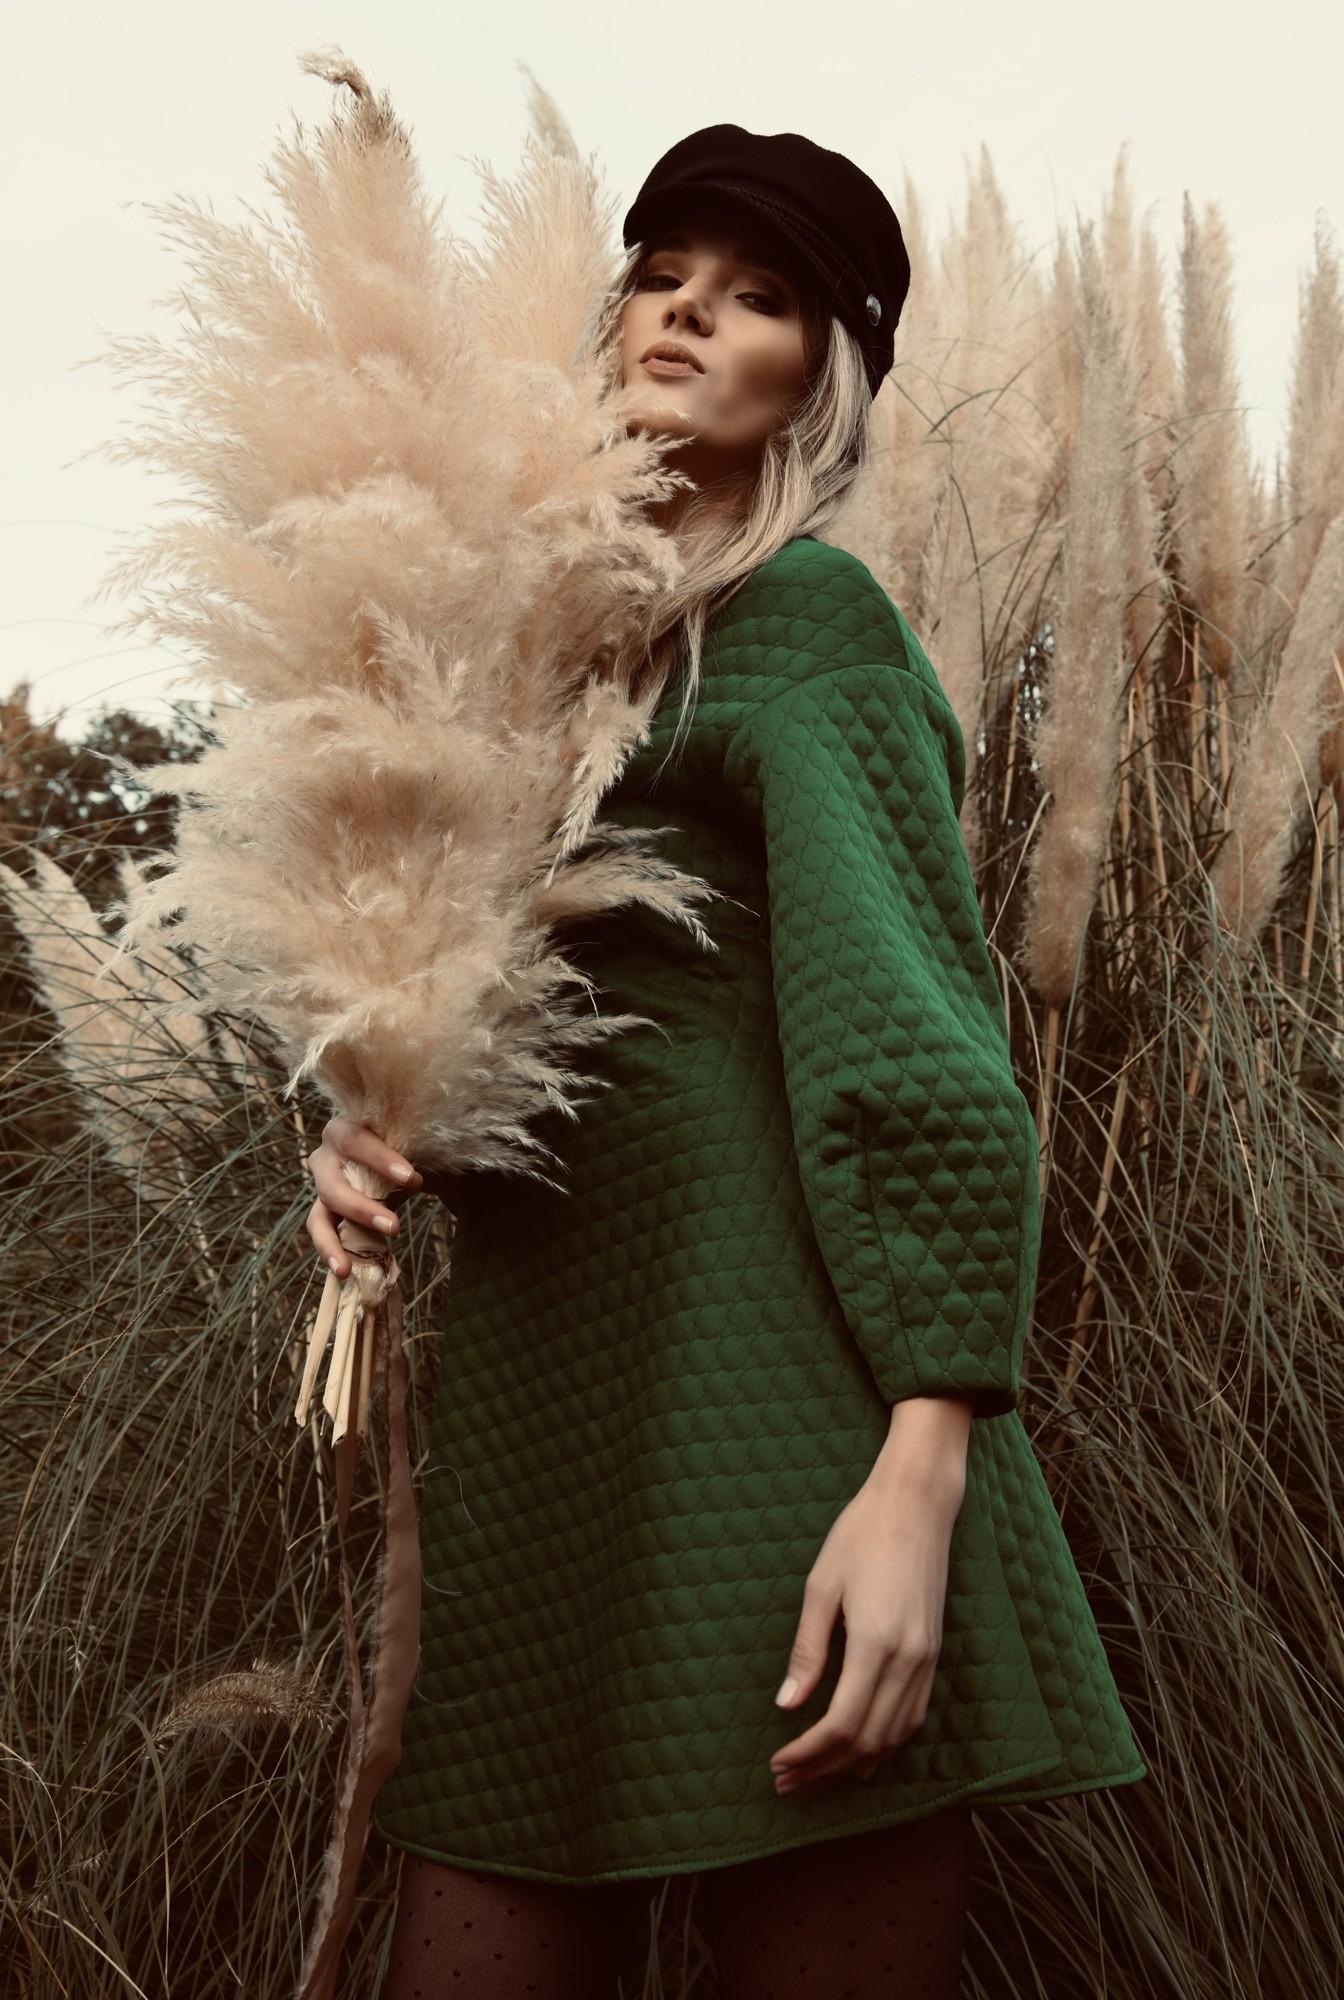 0 - rochie din material matlasat, verde, scurta, evazata